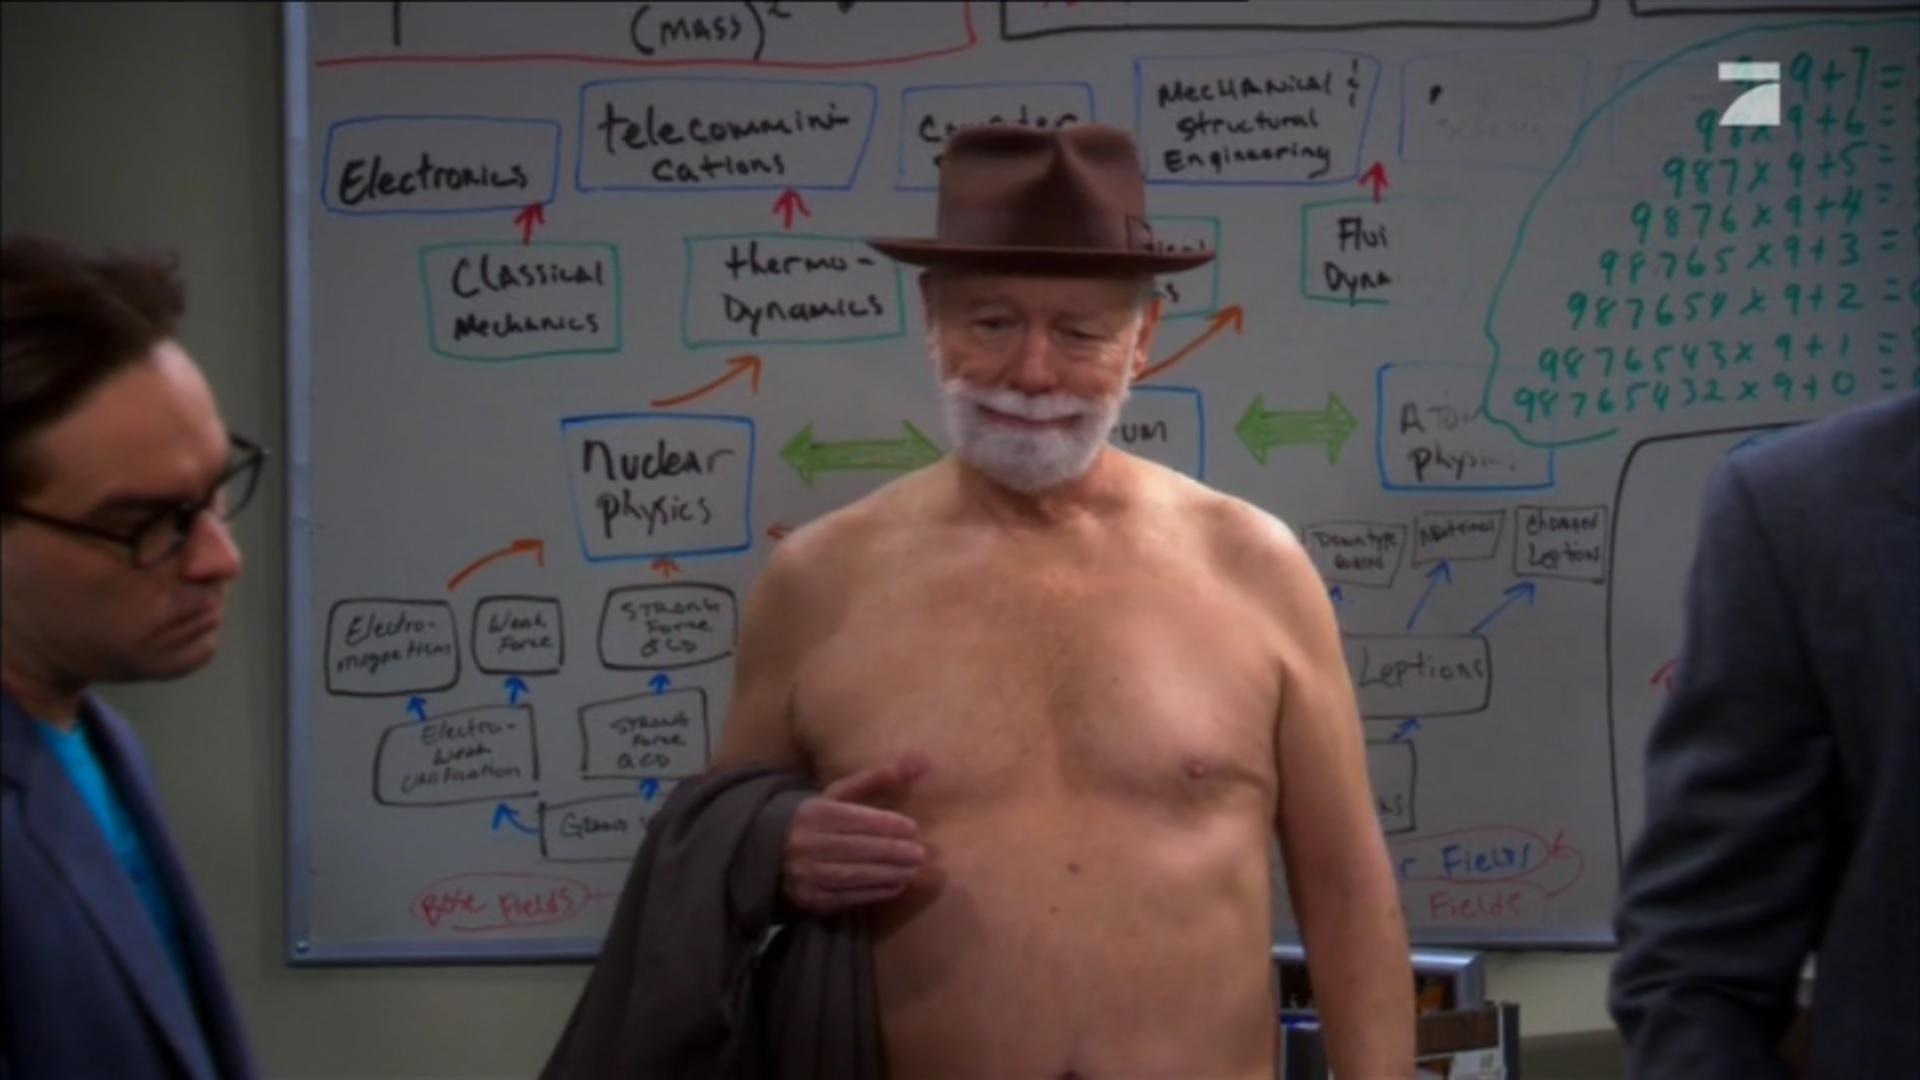 Professor Rothman